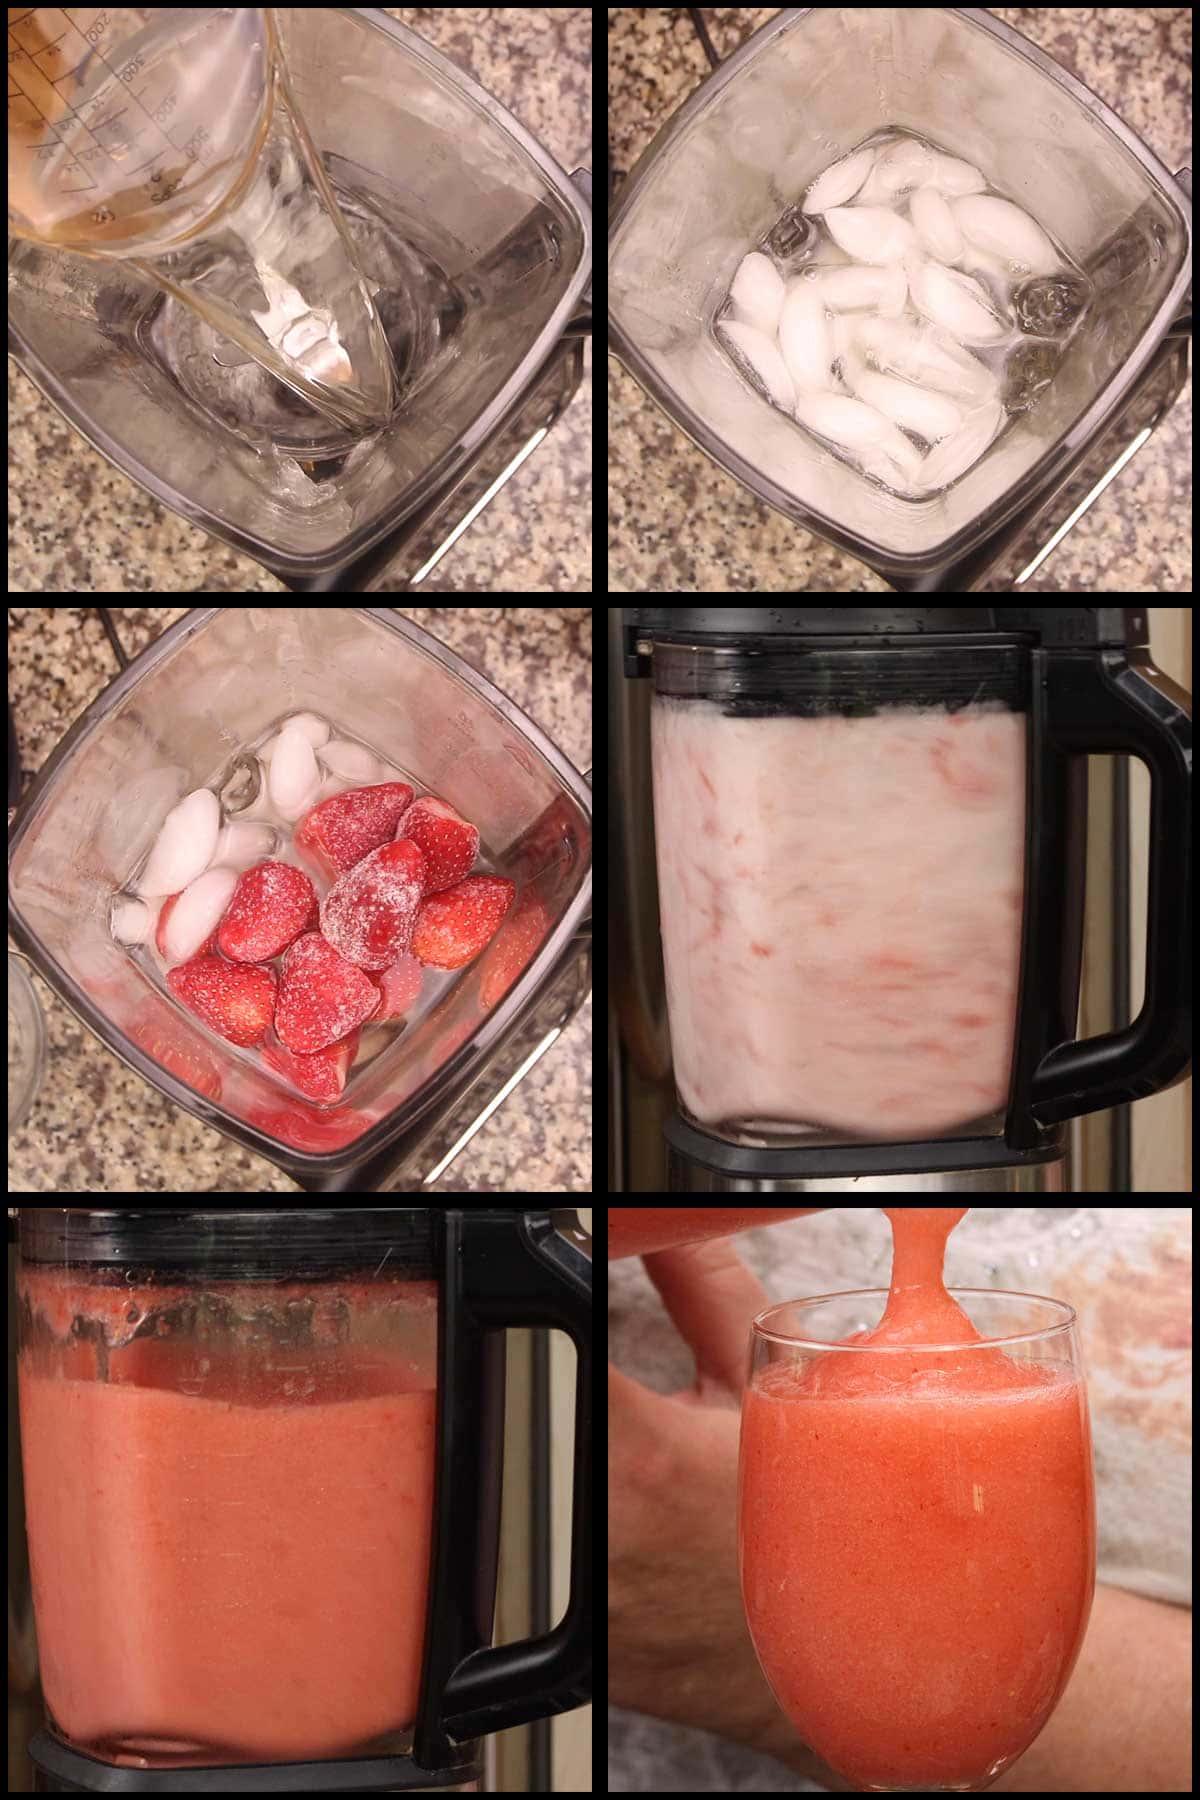 blending and pouring strawberry wine slushies